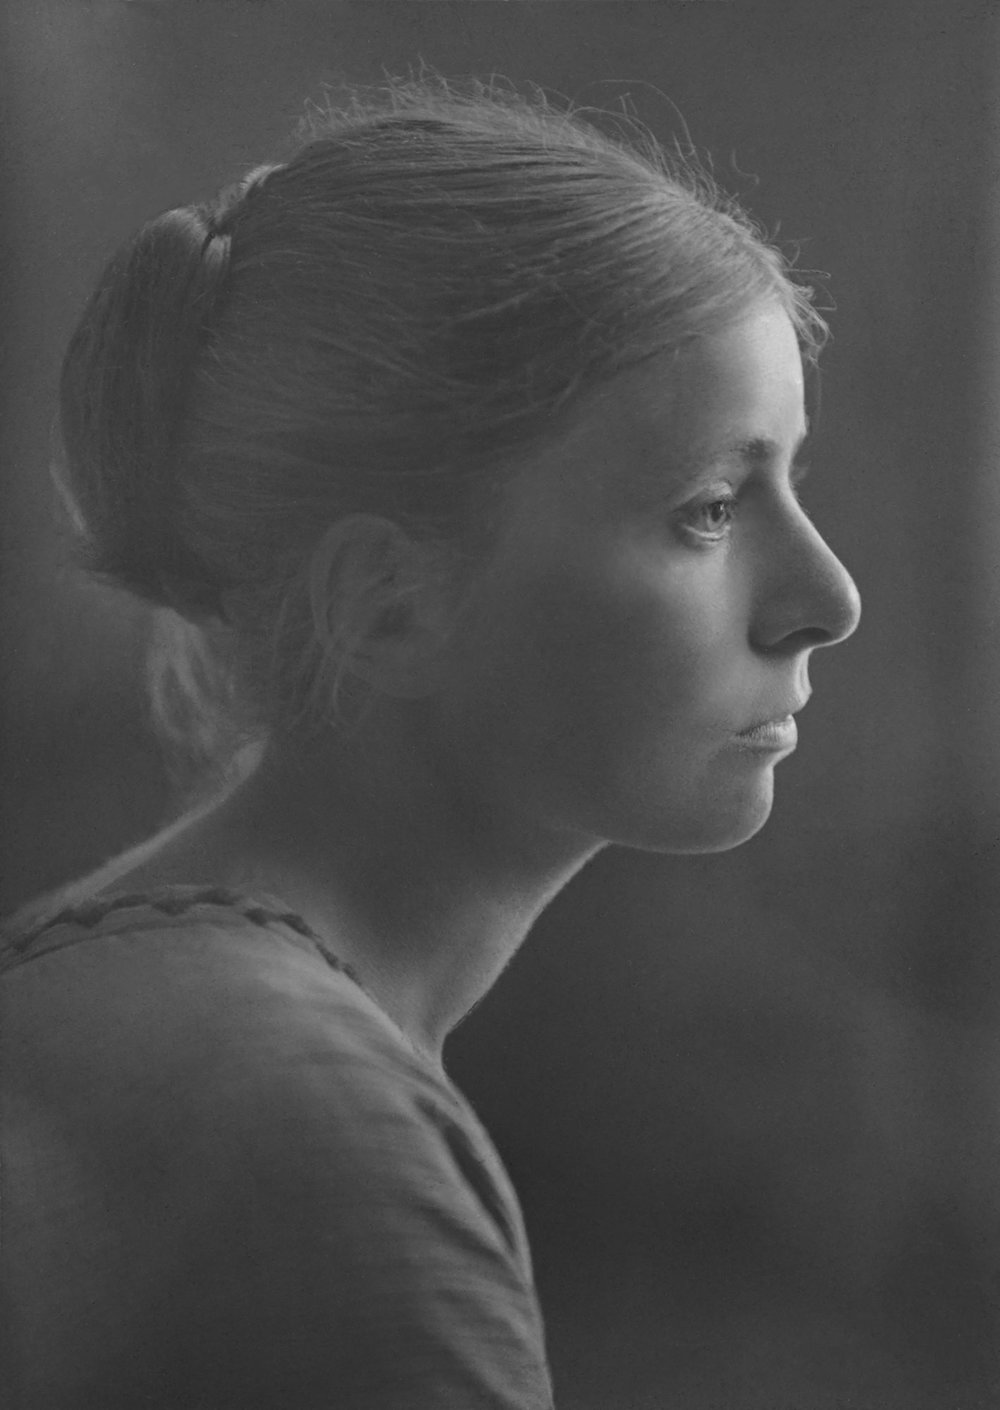 Gertrude Bardenhewer, Rostock, 1922